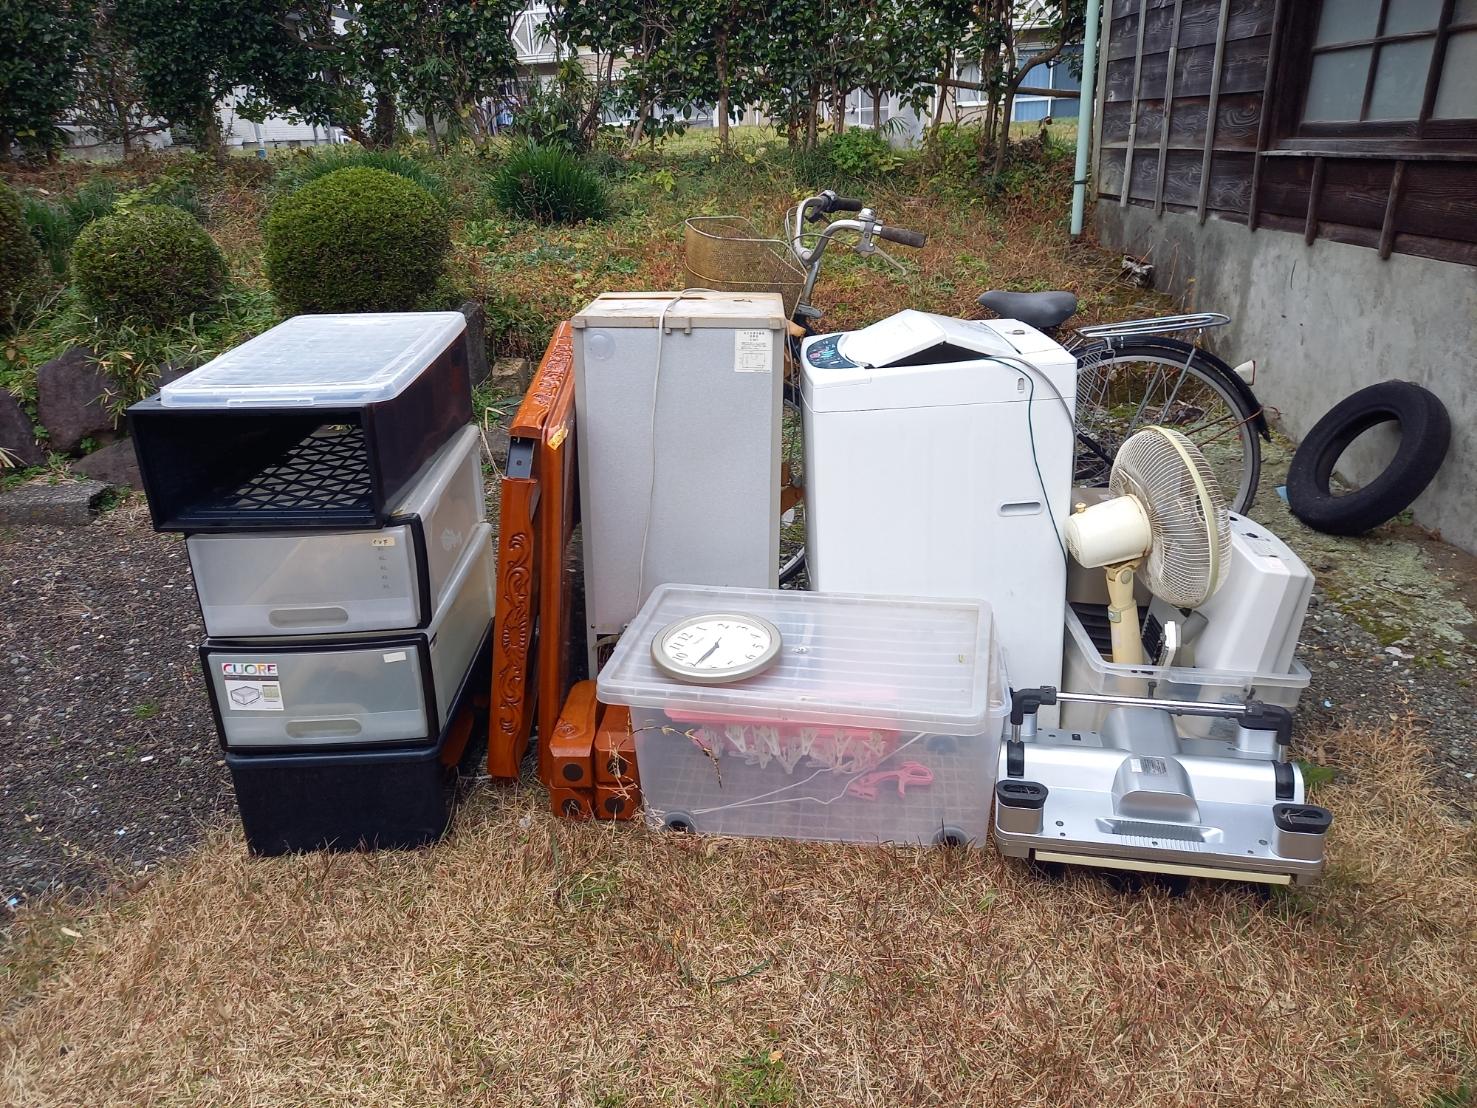 冷蔵庫、洗濯機、収納ケース、扇風機の回収前